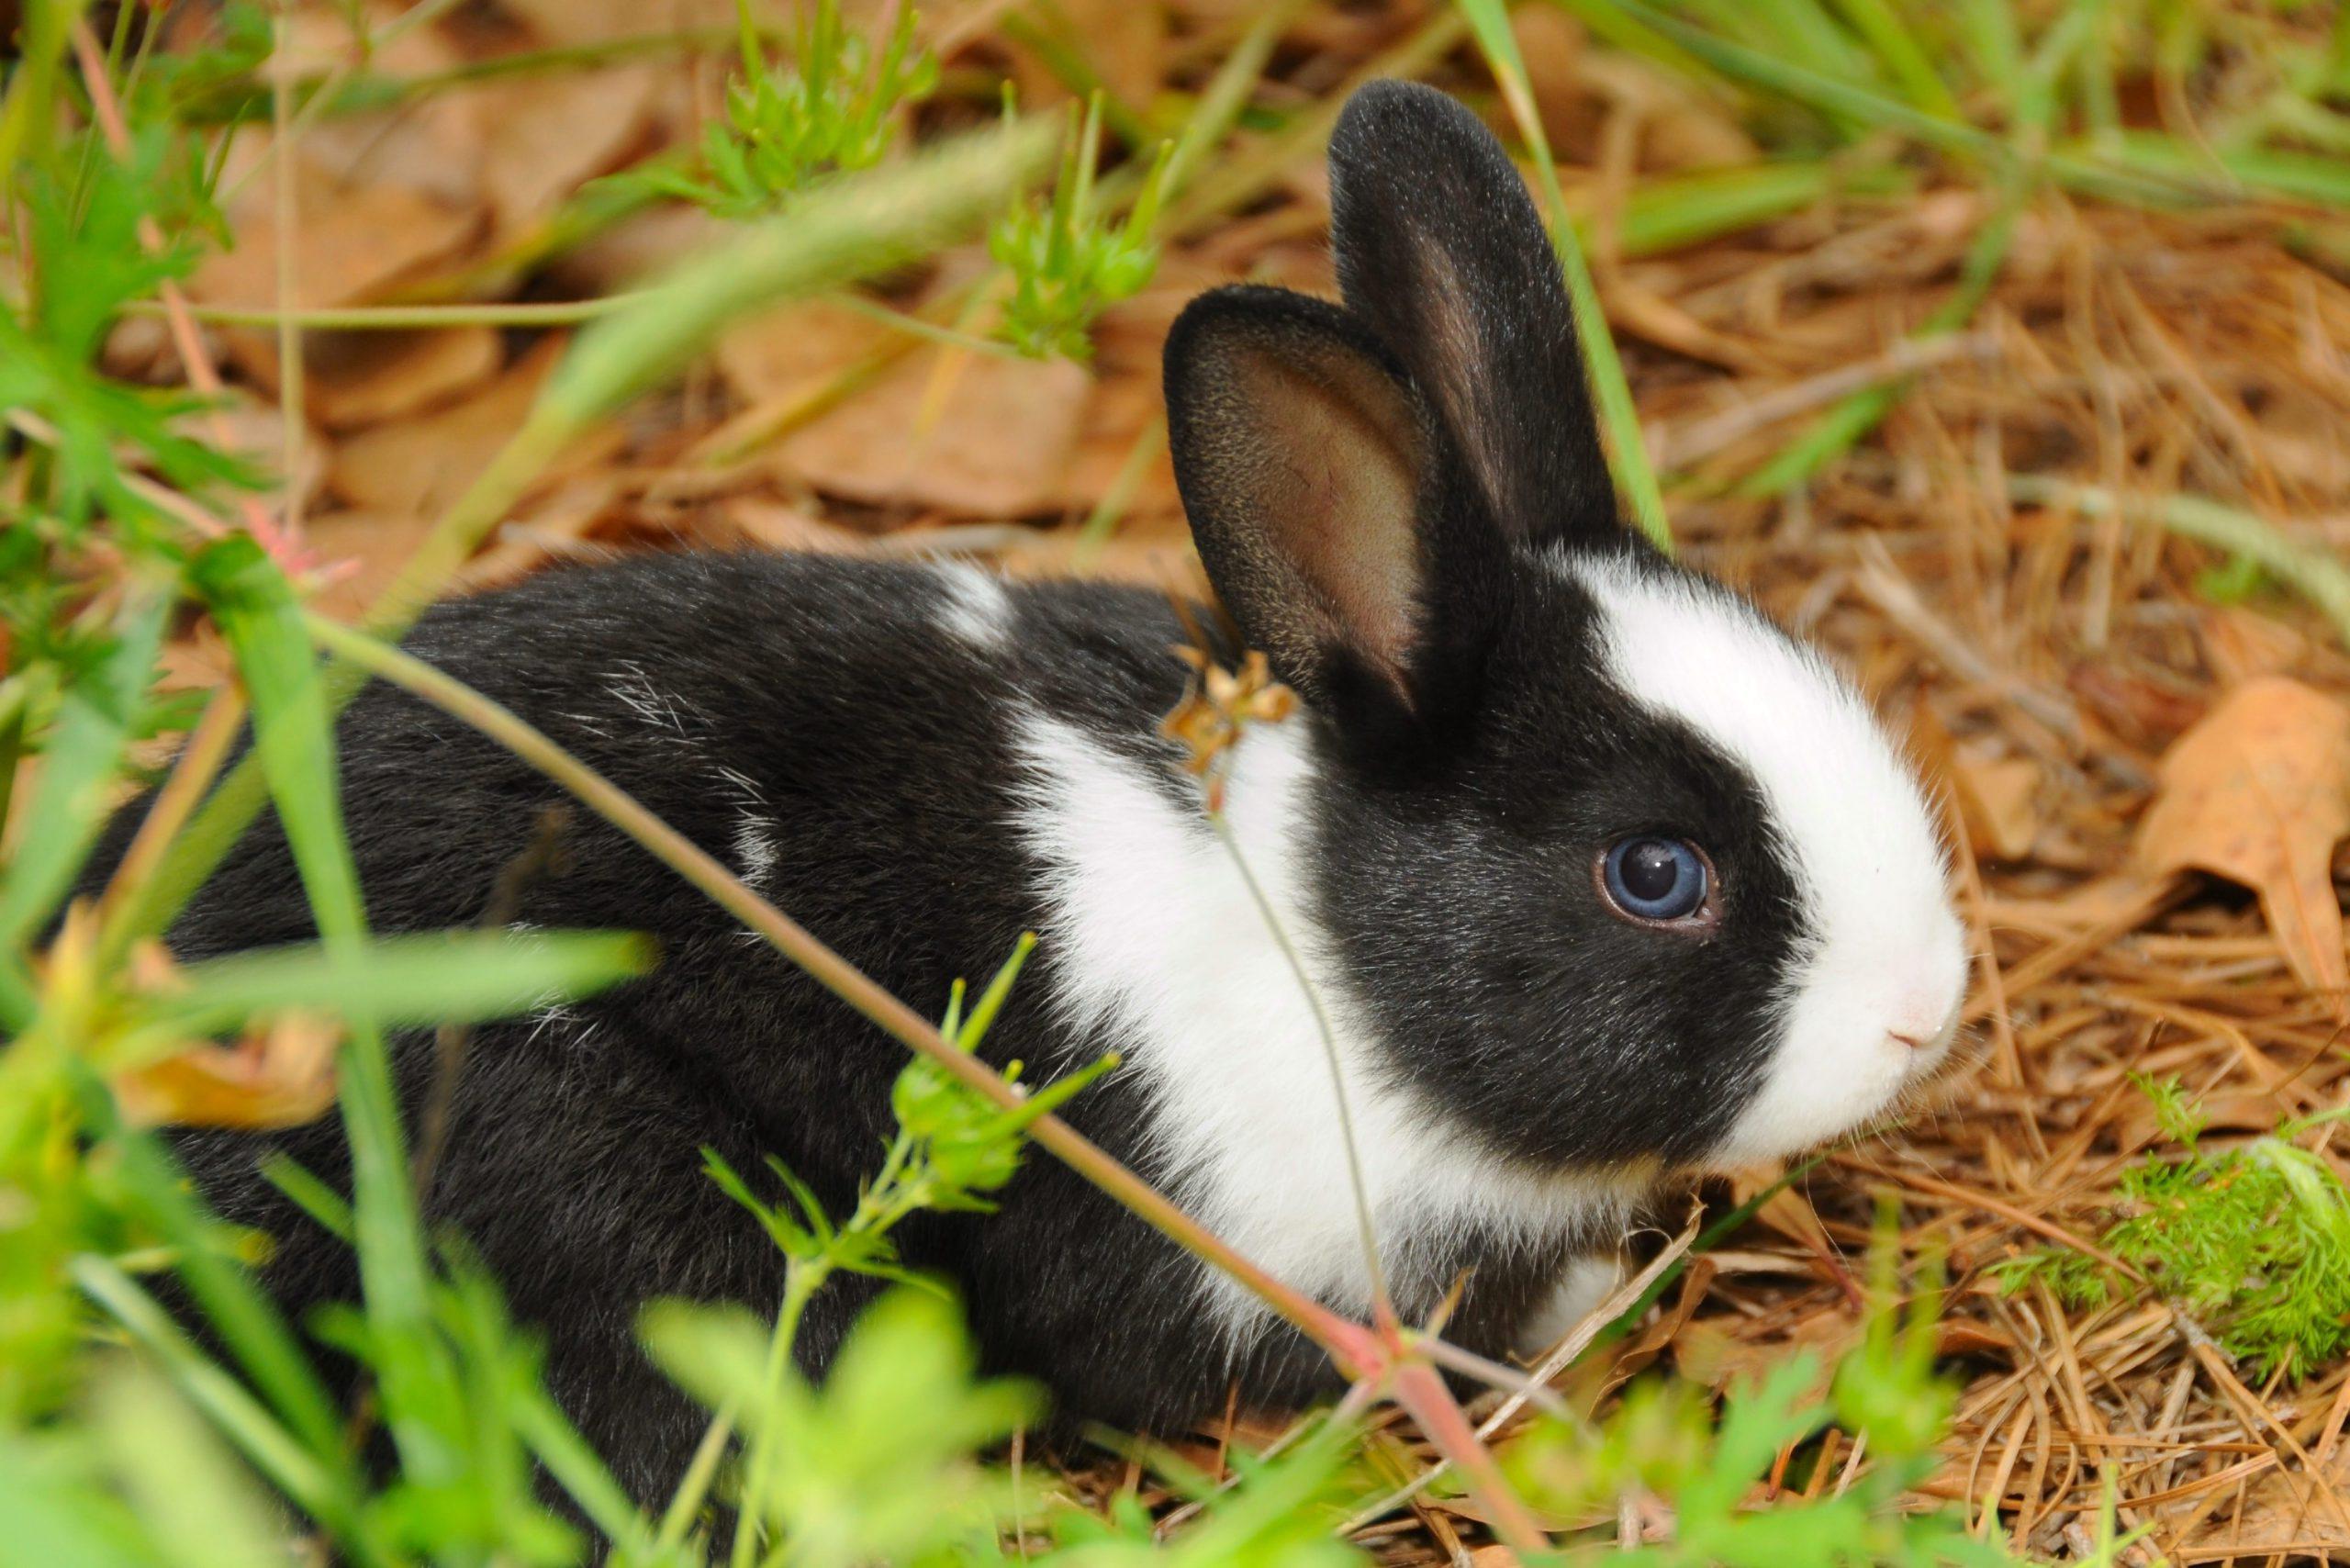 Cute Bunnies Image